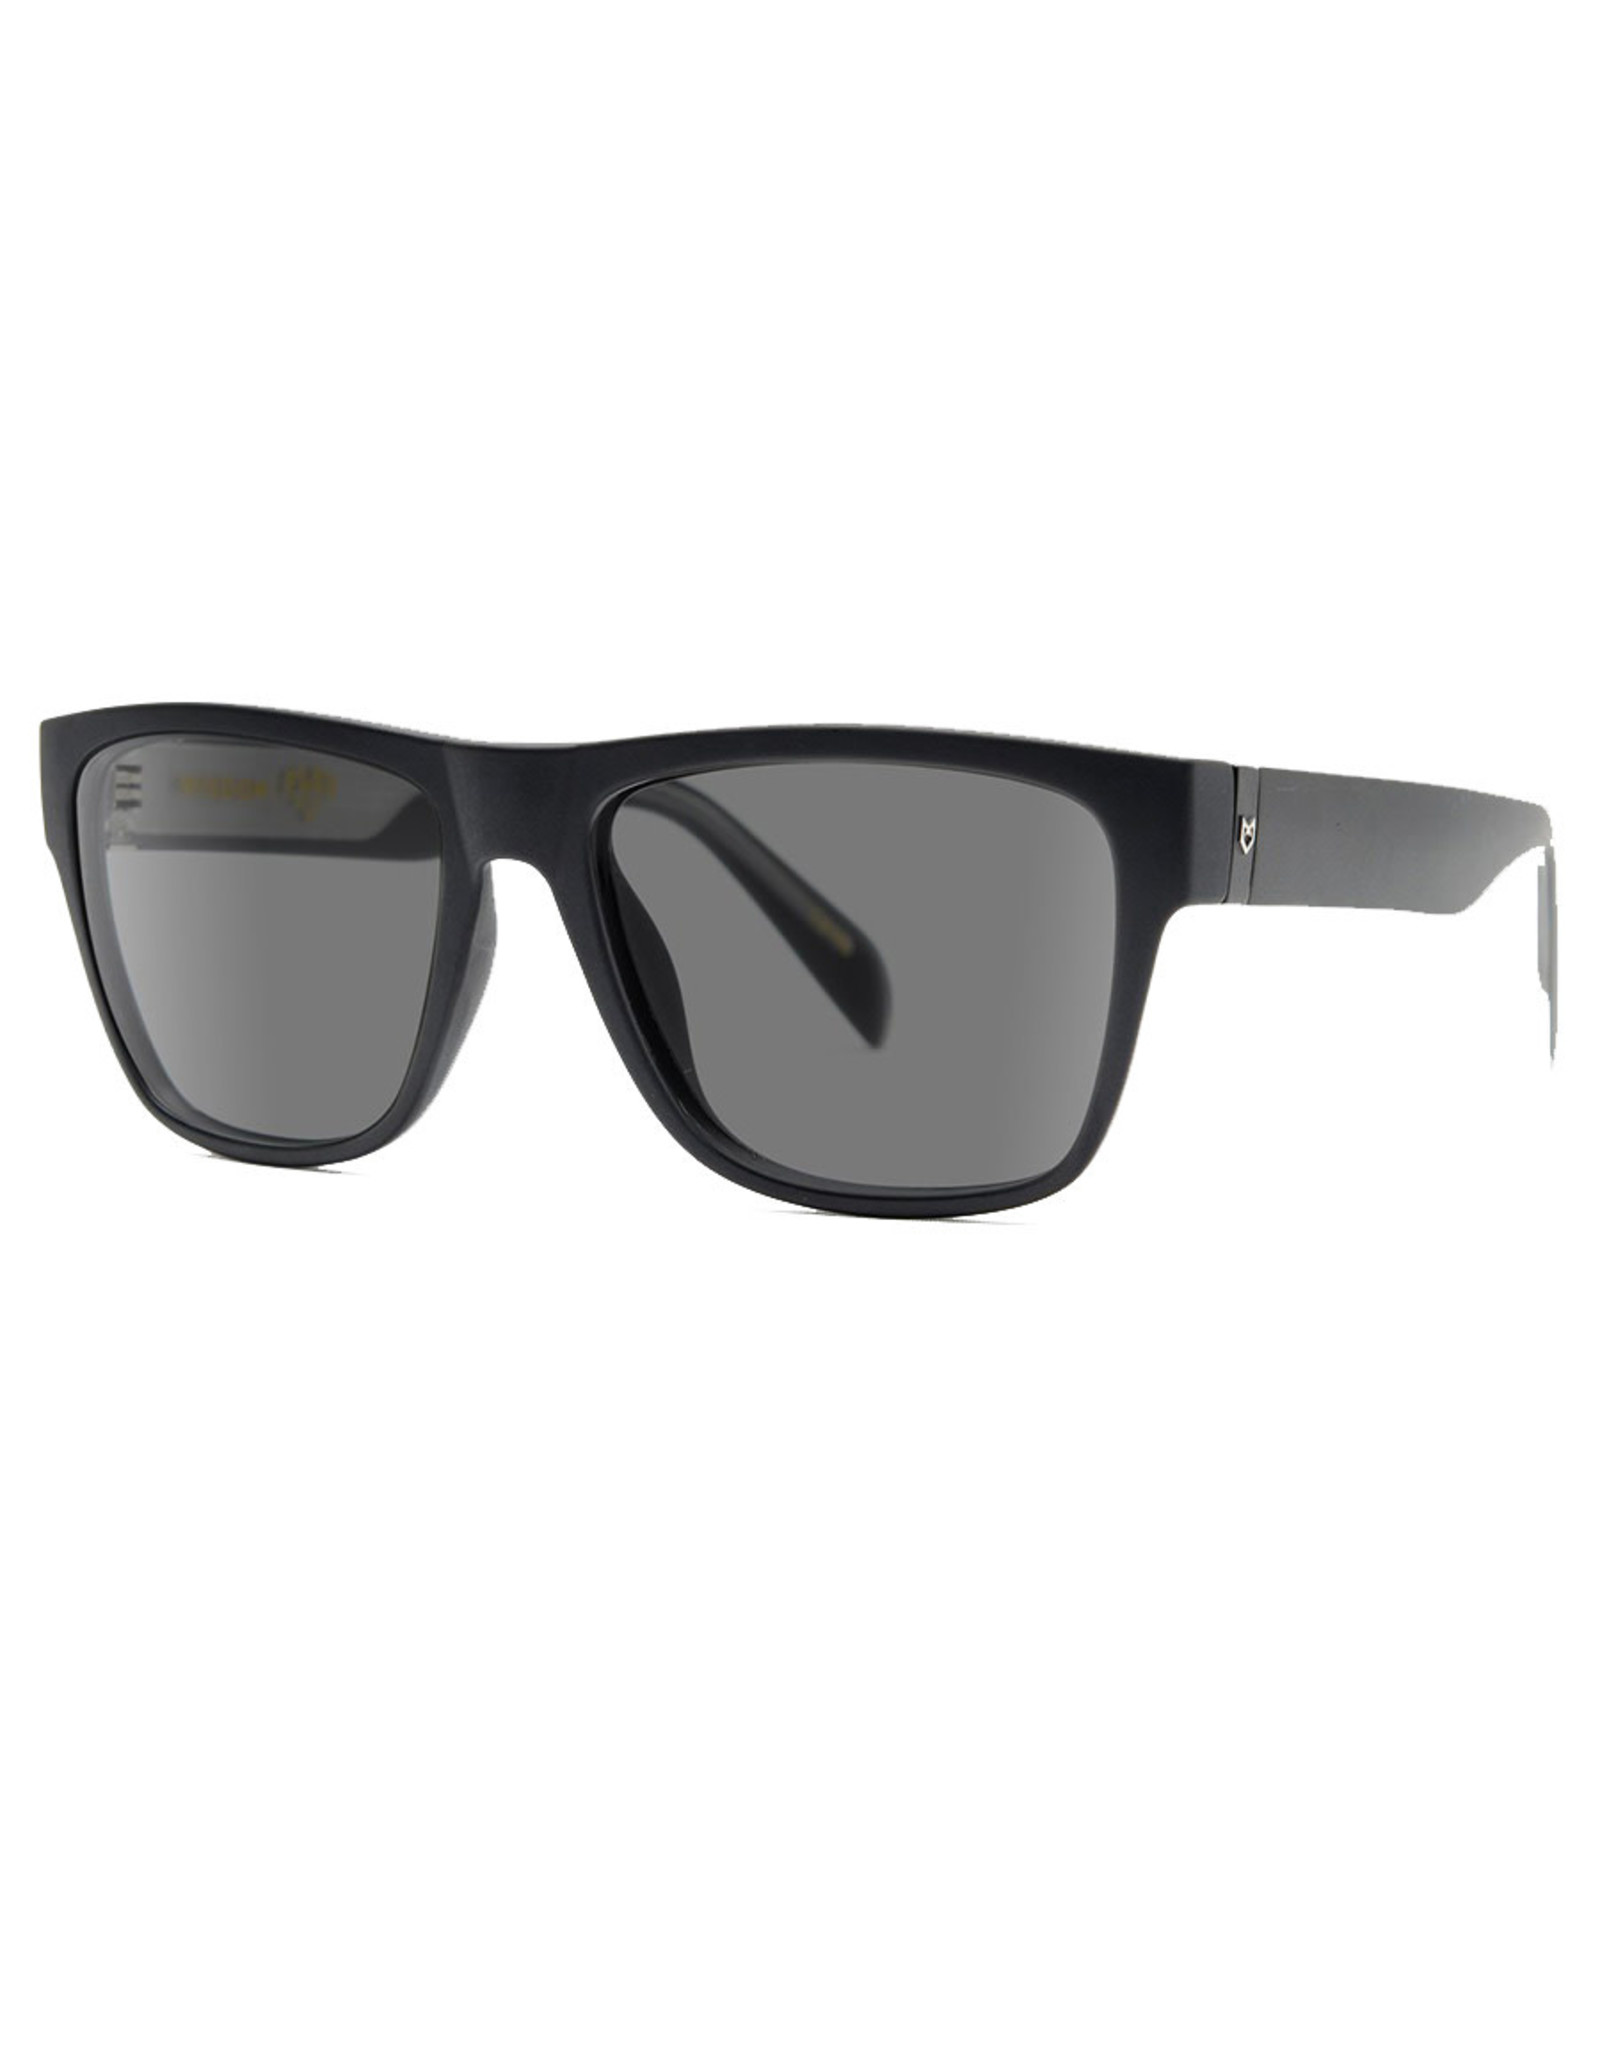 Madson Madson Sunglasses Wisdom (Black Matte/Grey Polarized Lens)